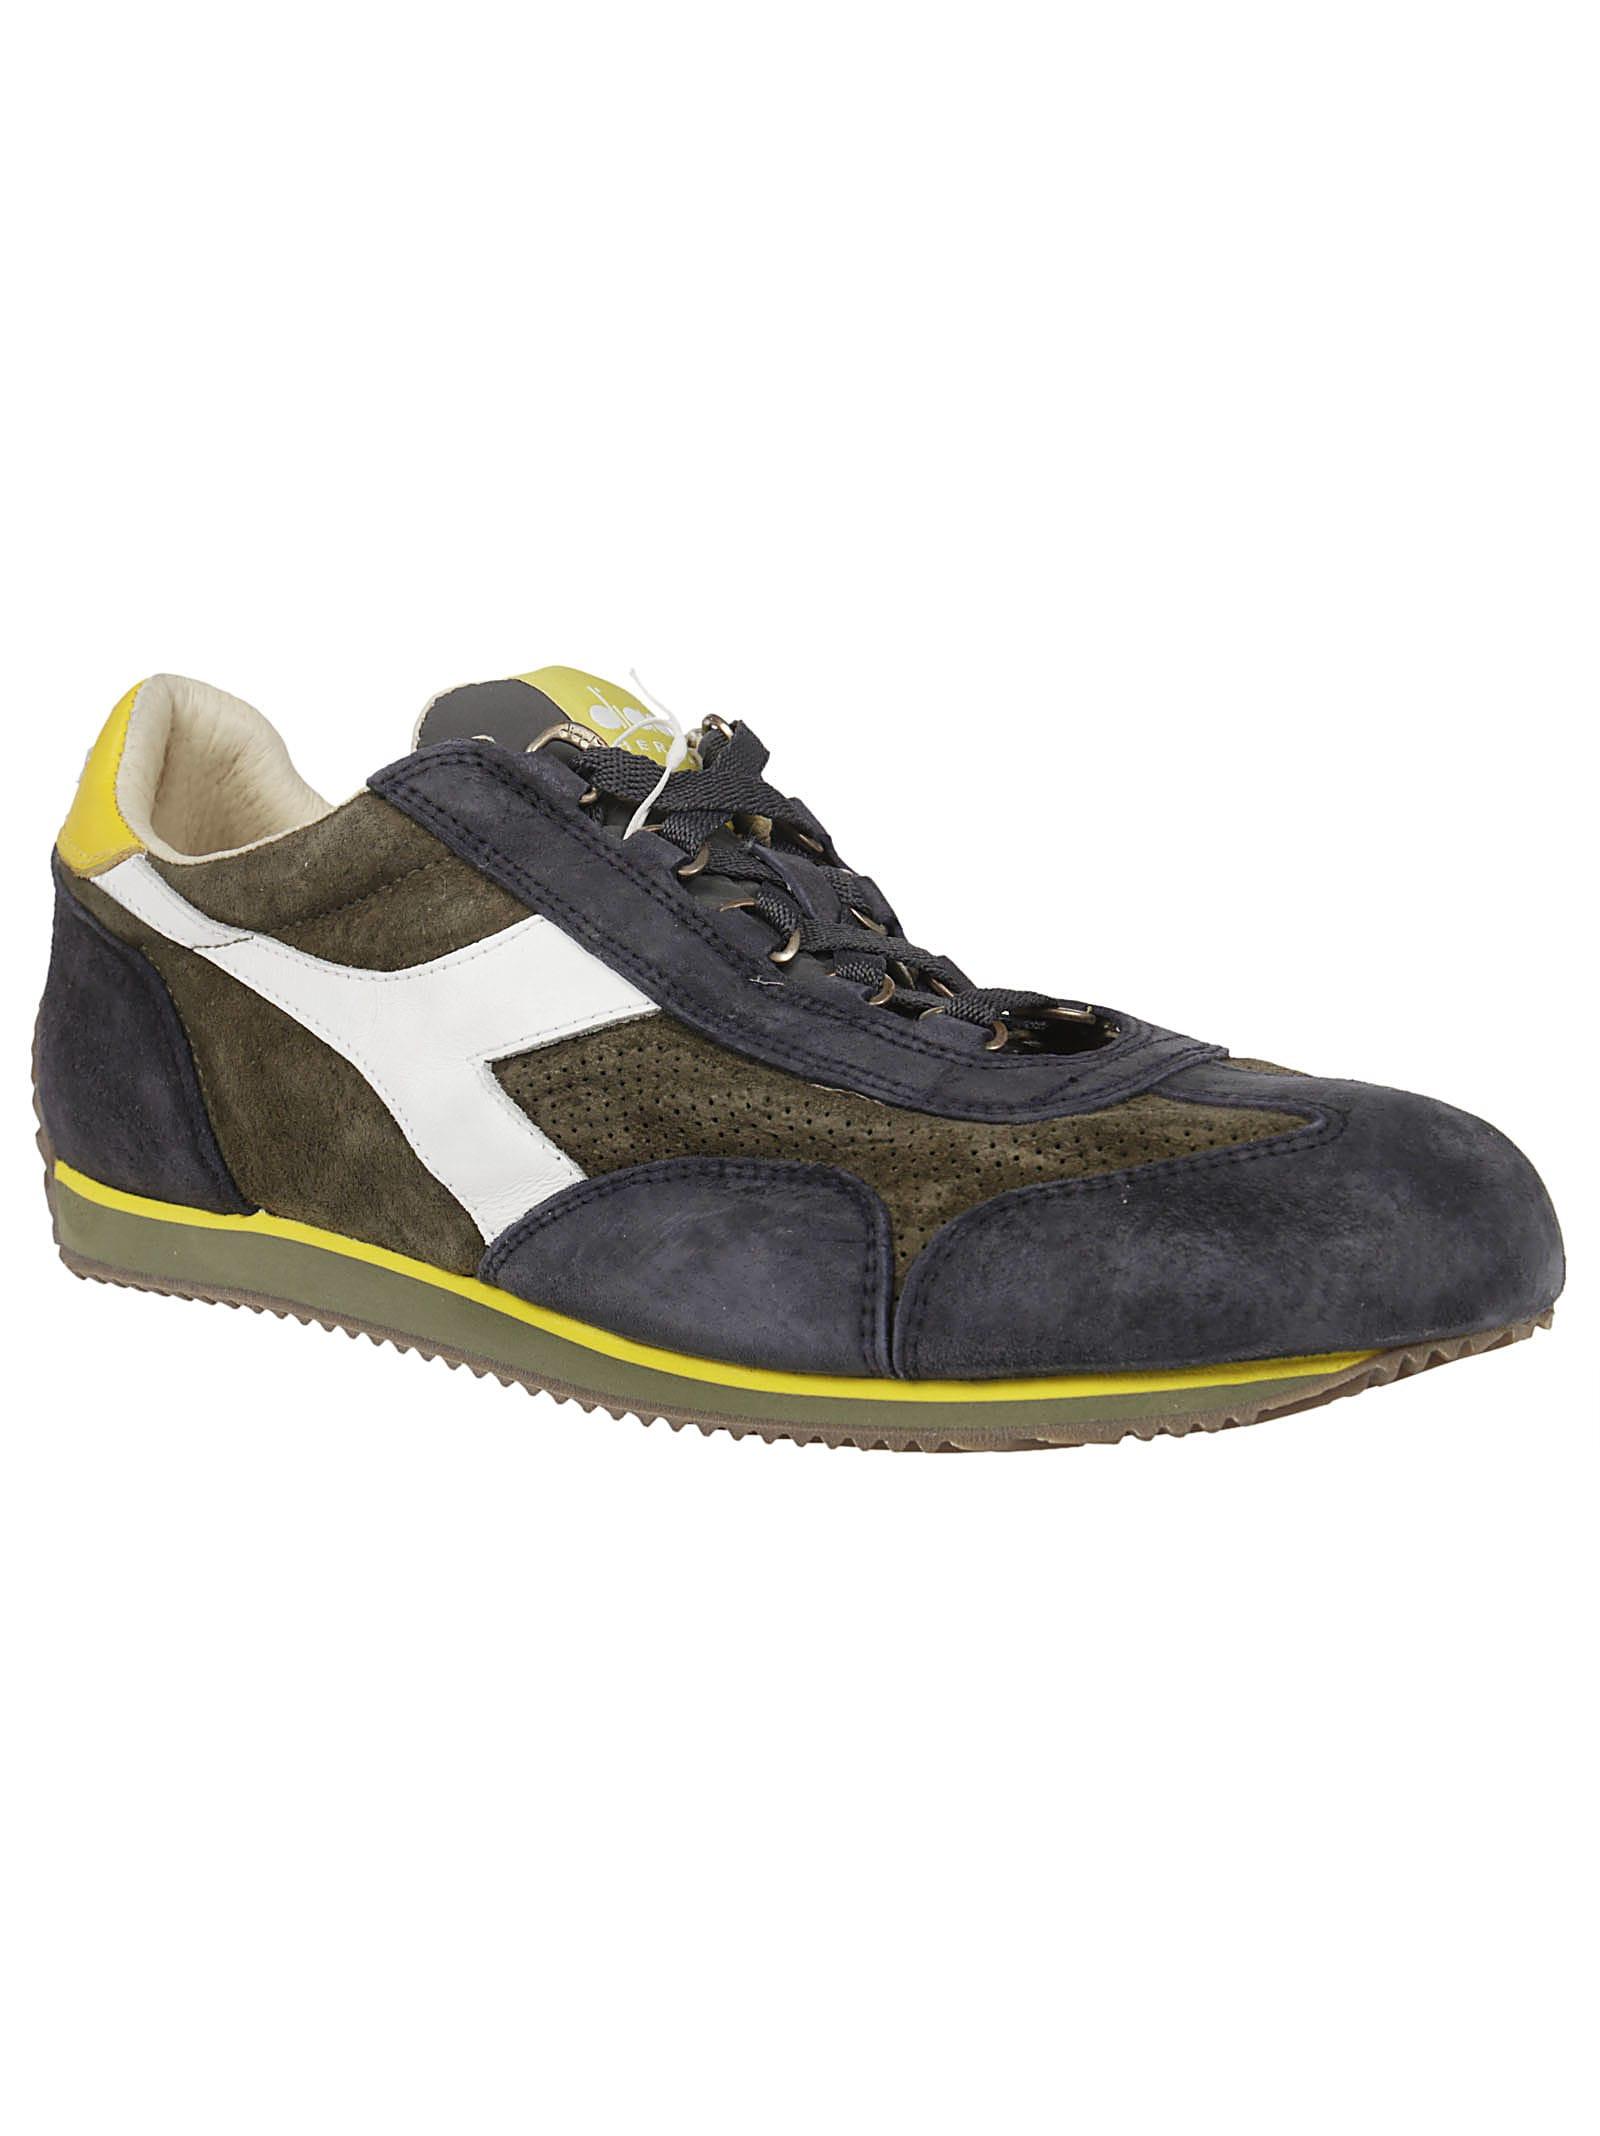 best sneakers 86df3 e5e96 Diadora Heritage Equipe Sneakers